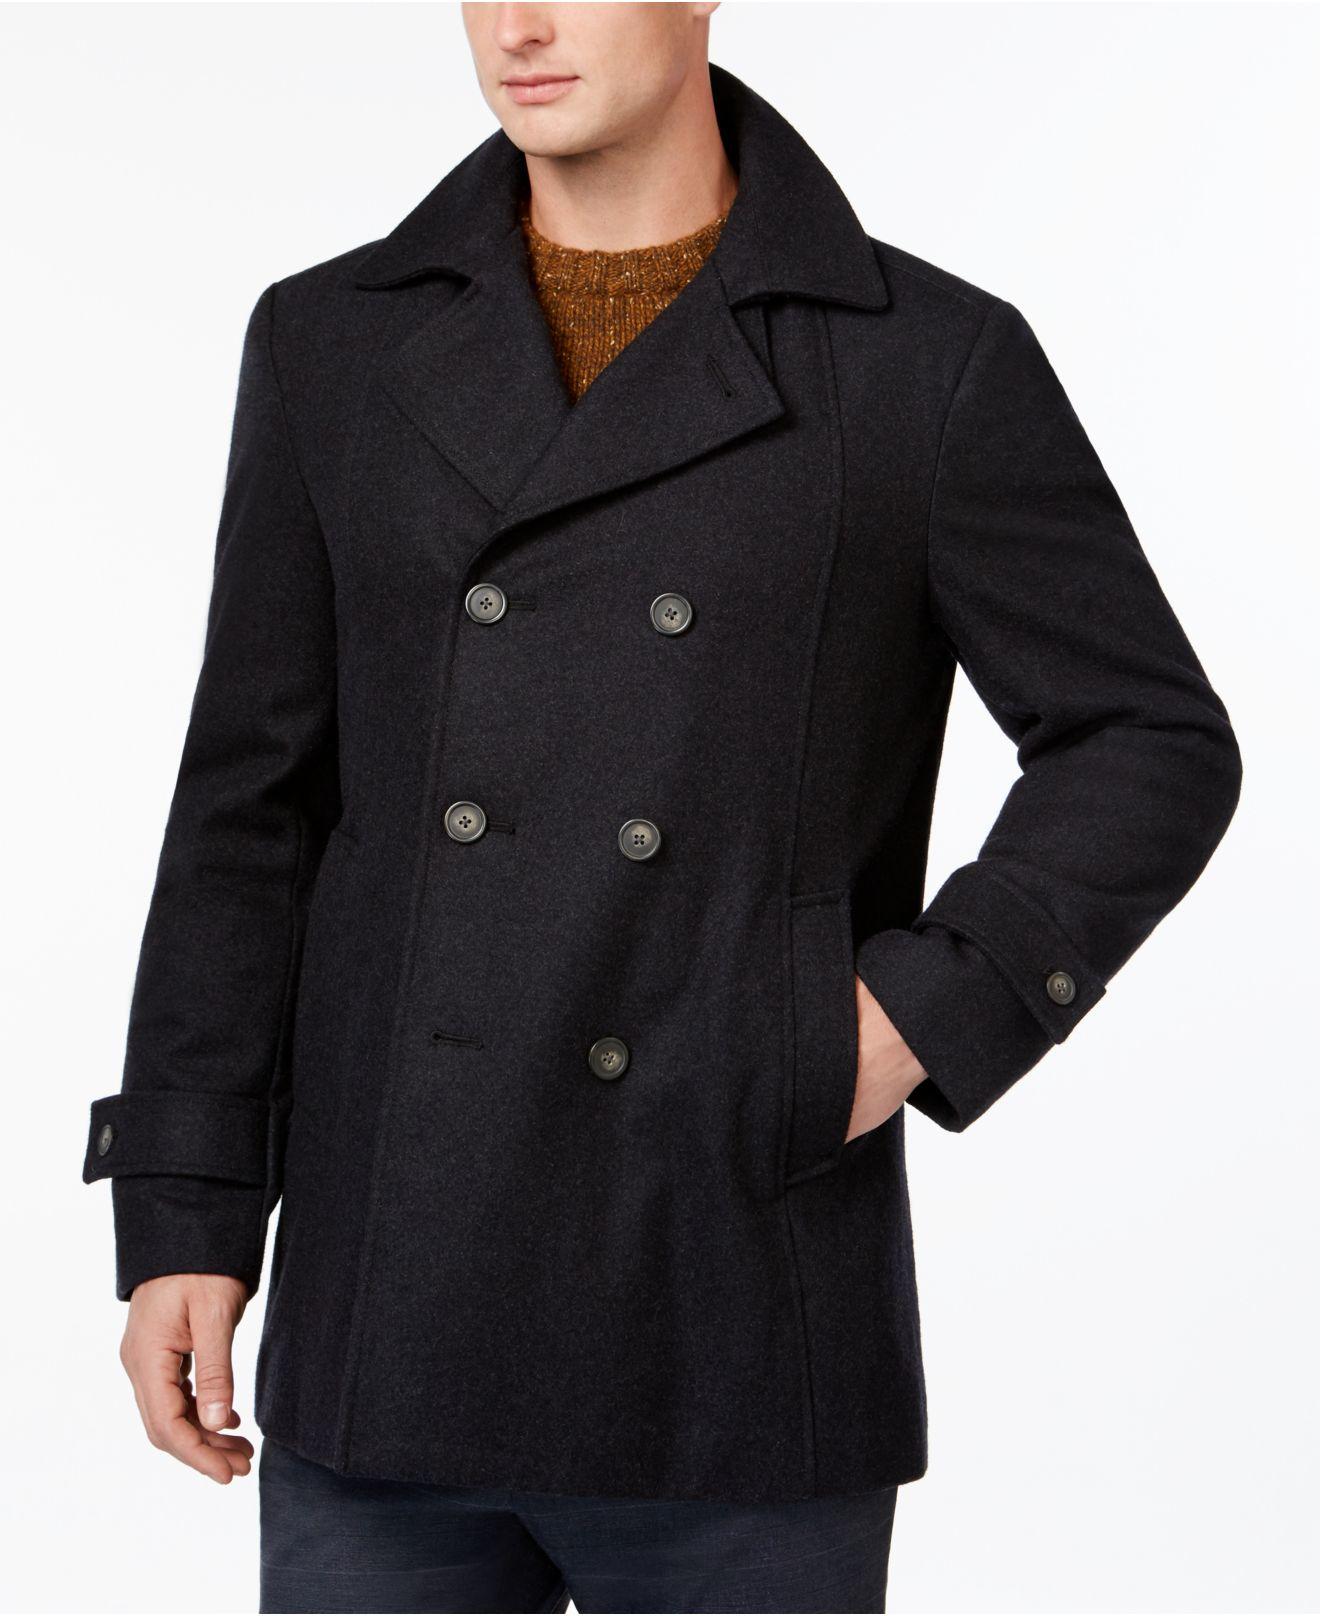 tommy hilfiger brady slim fit overcoat in gray for men lyst. Black Bedroom Furniture Sets. Home Design Ideas